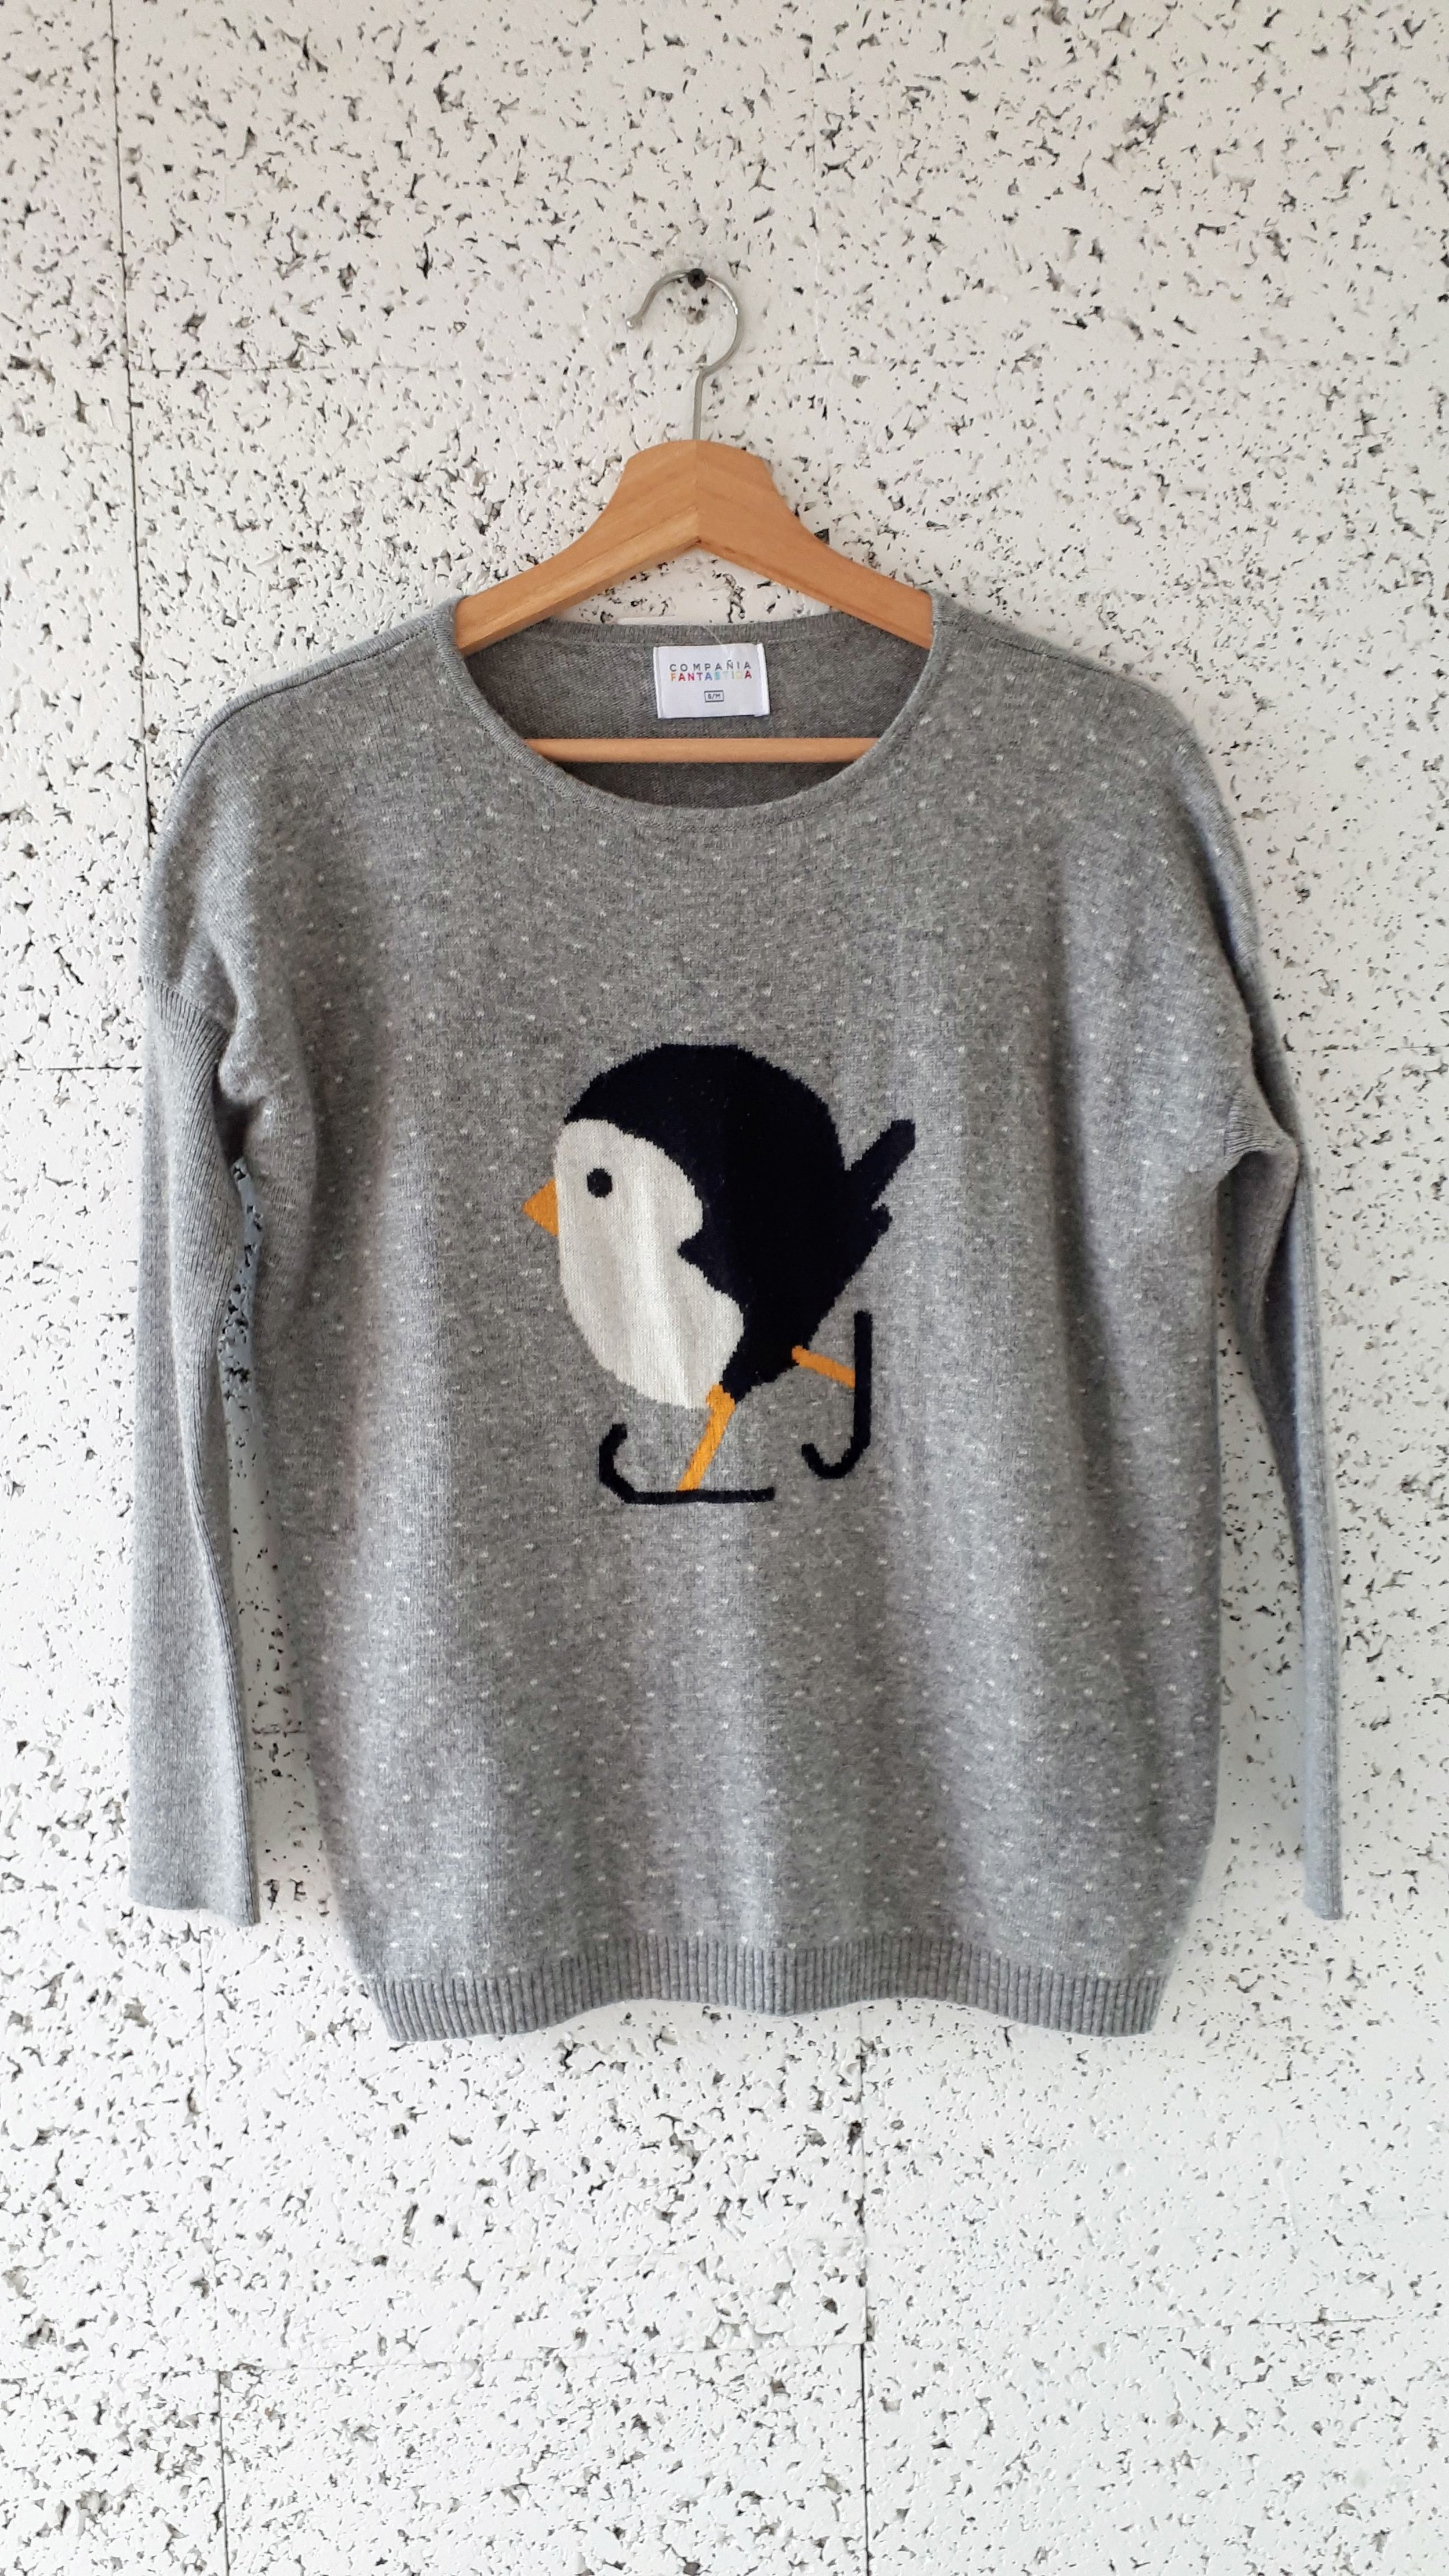 Compania Fantastica sweater; Size M, $48